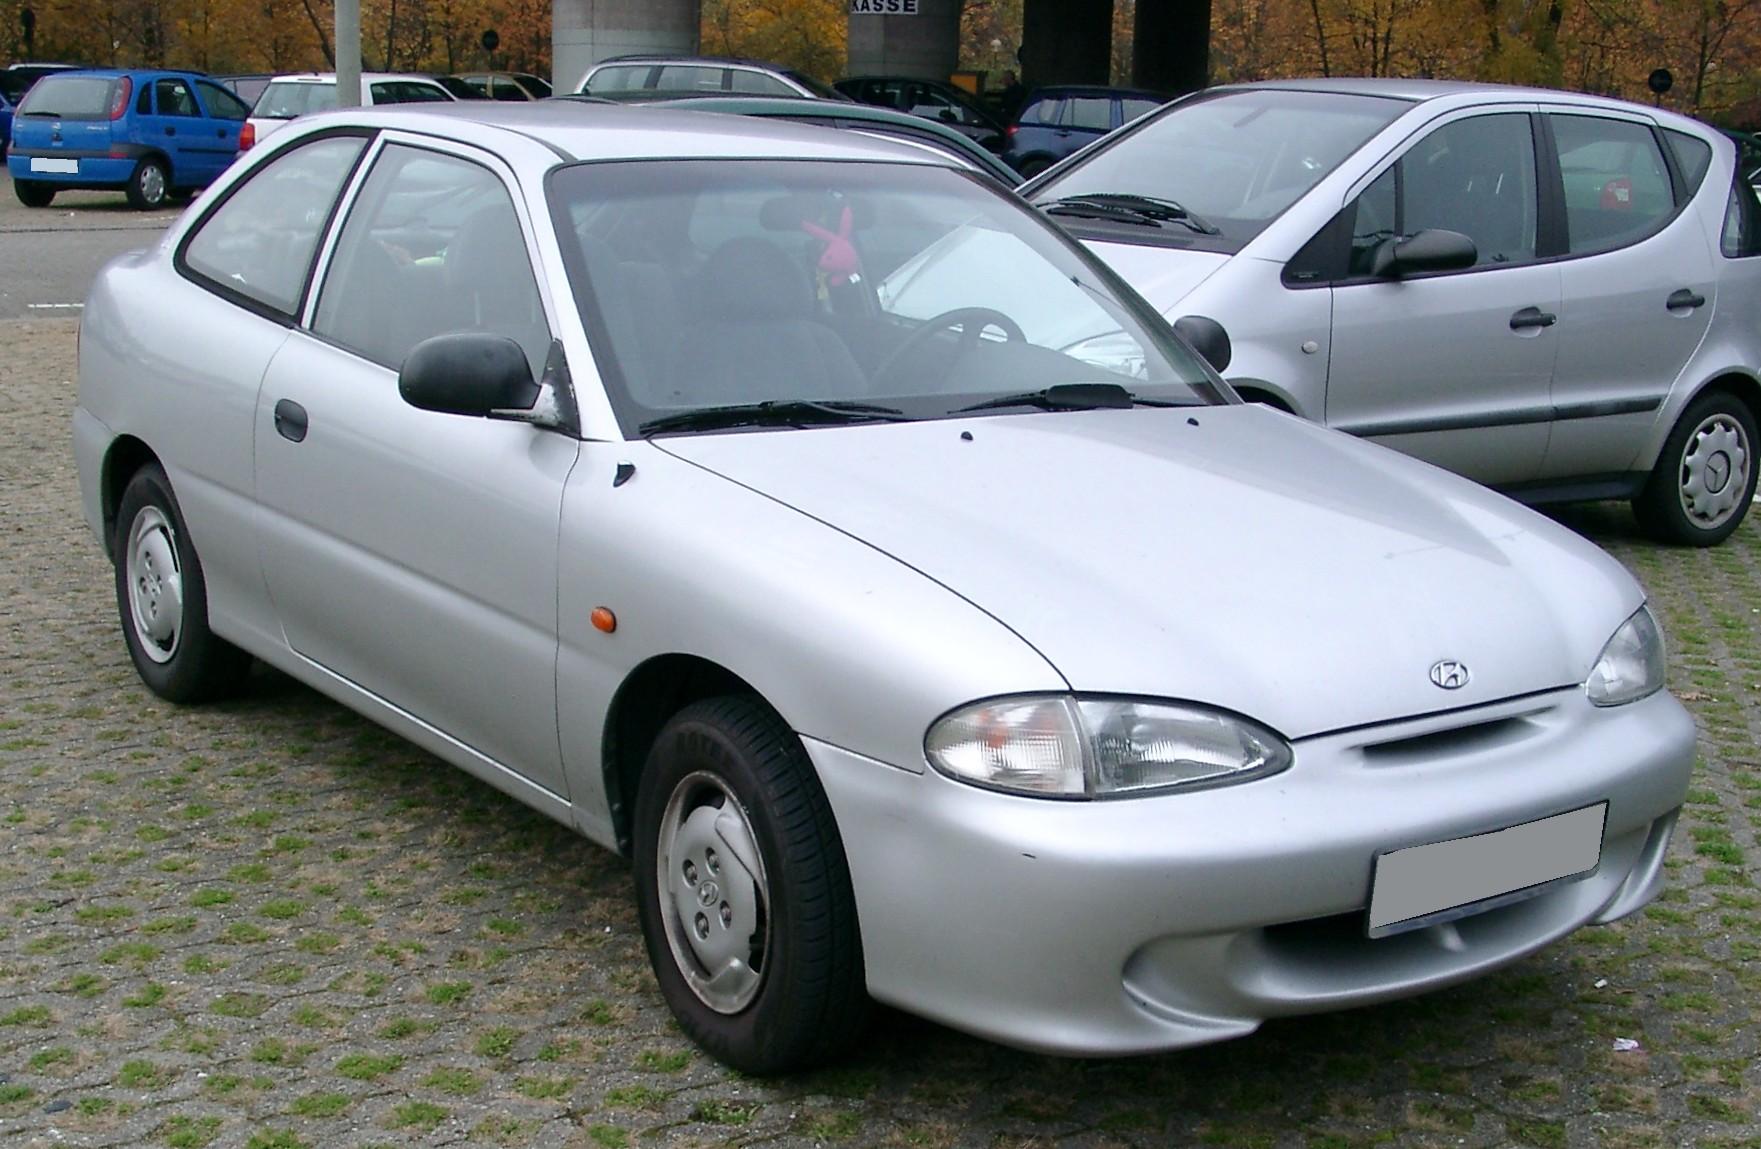 Hyundai Accent Wikipedia